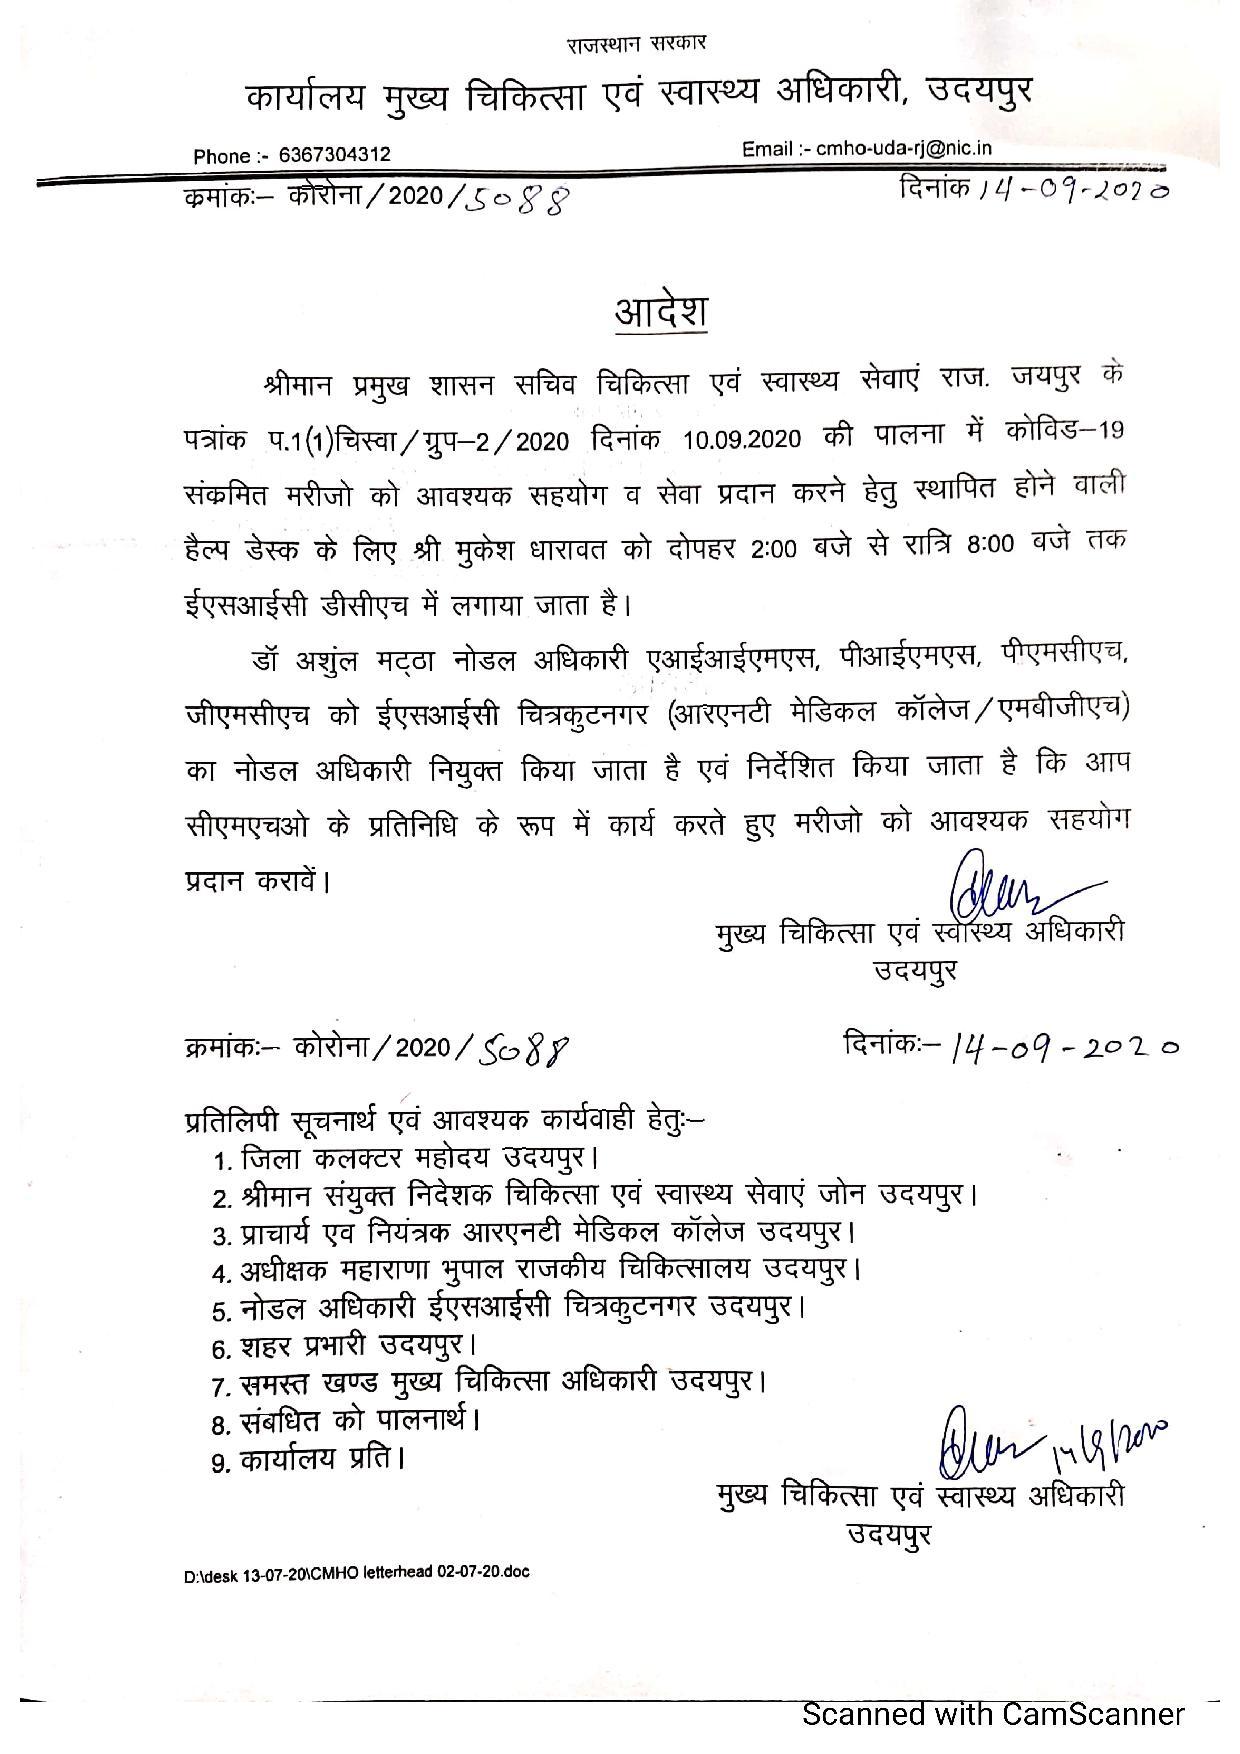 Corona Help Desk ESIC Udaipur